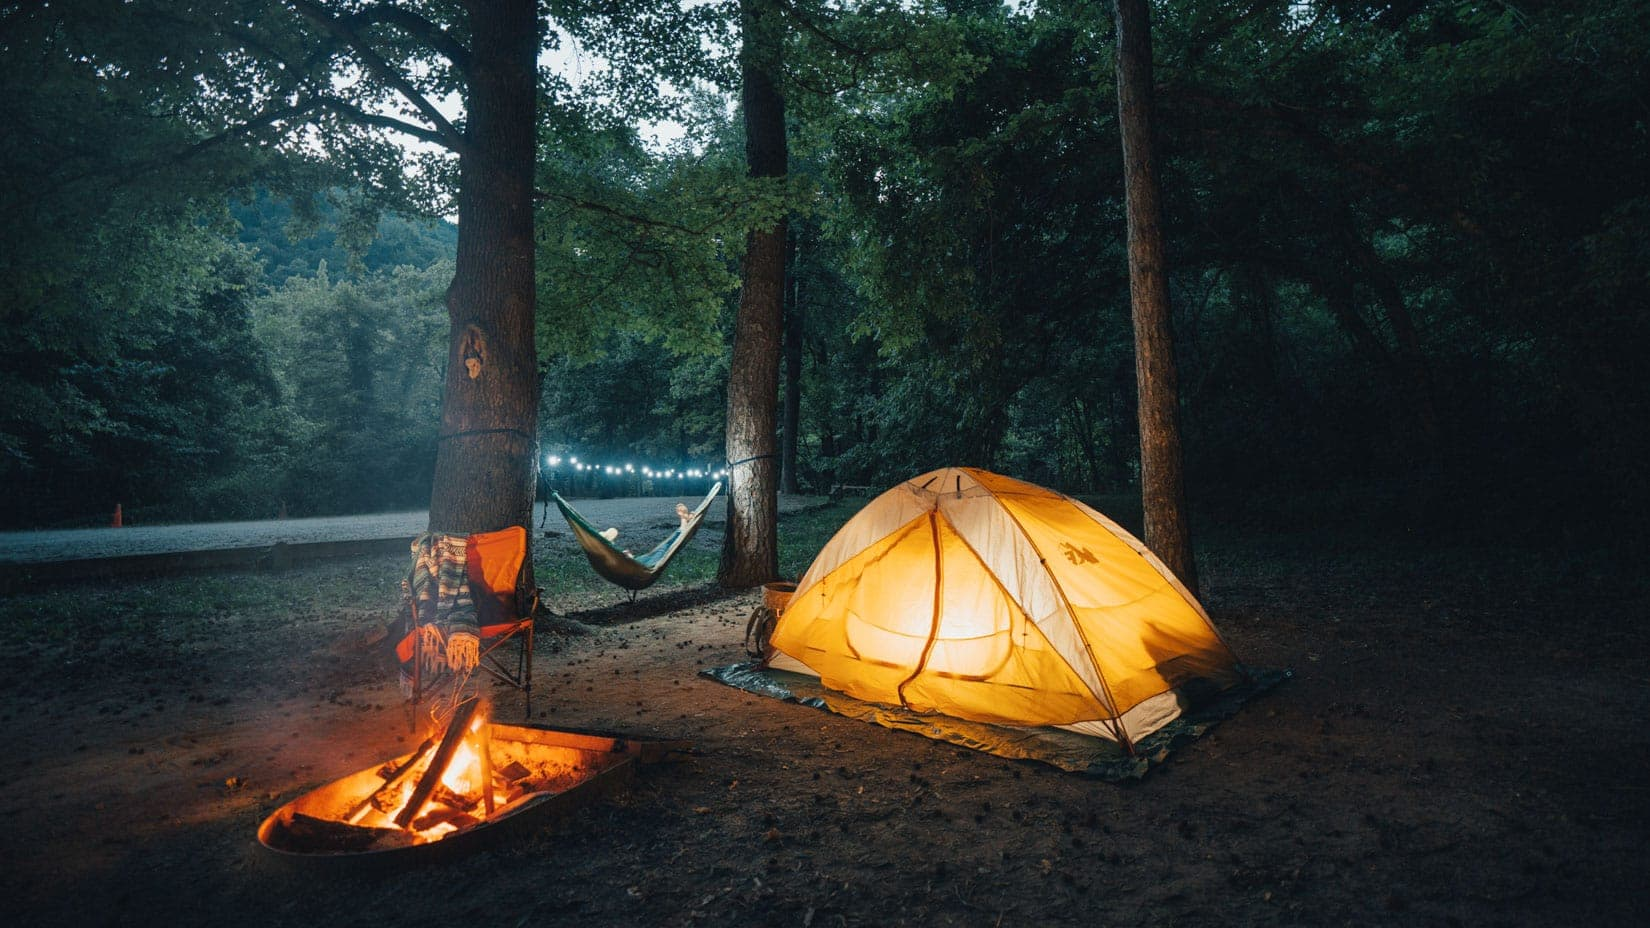 Camping at Kyles Landing